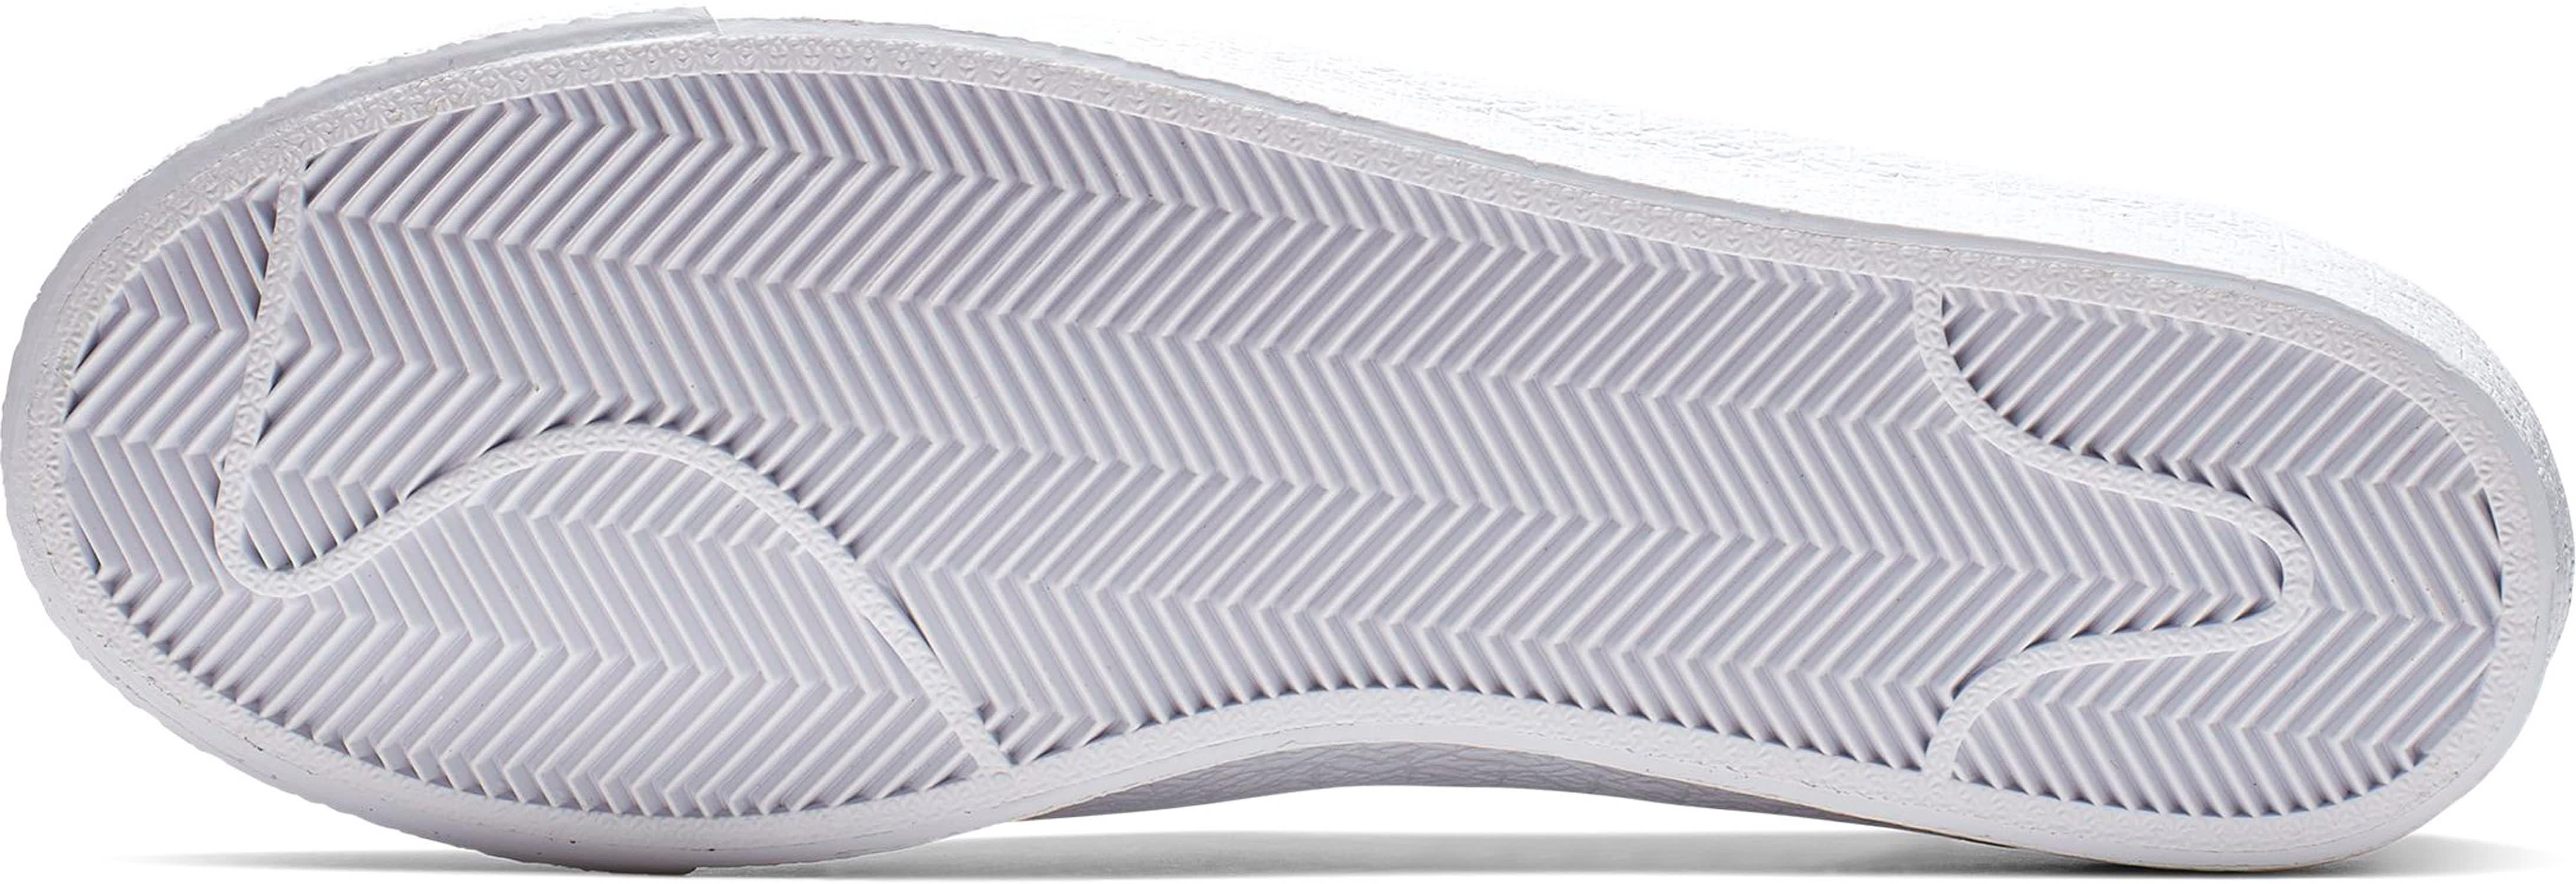 48f383af3b7ee Nike SB Air Zoom Blazer Low Canvas Skate Shoes - thumbnail 6